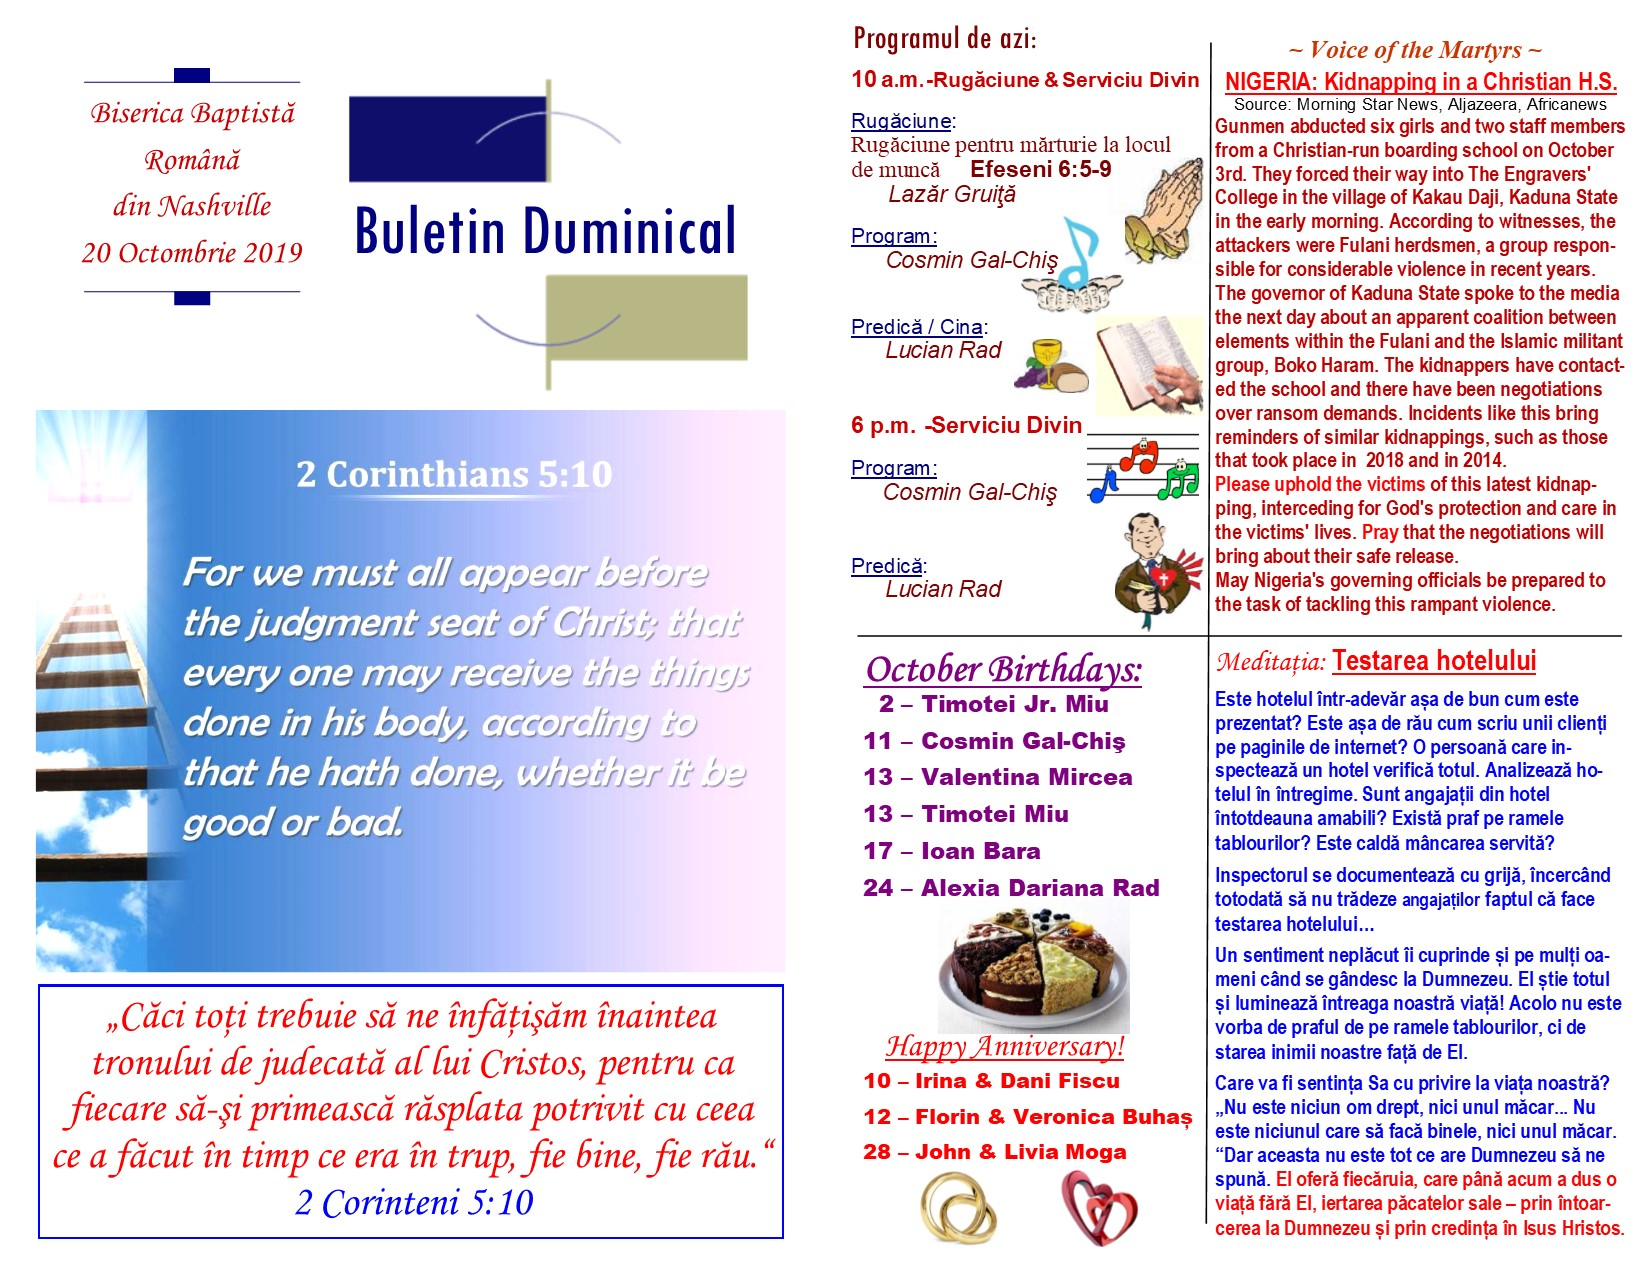 Buletin 10-20-19 page 1 & 2